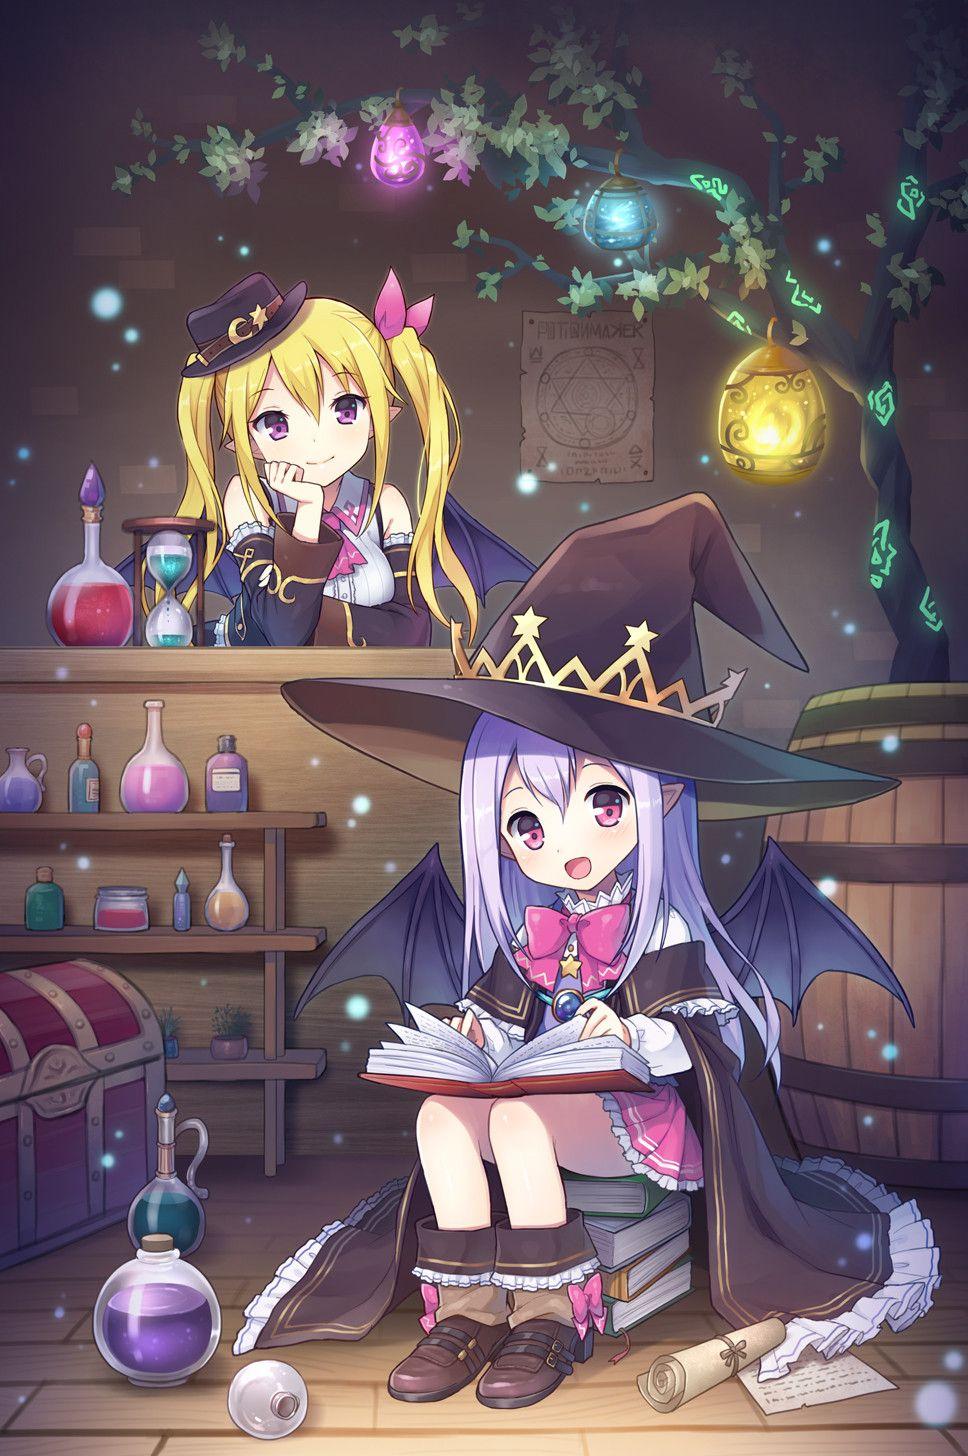 Hentai Arcade Games within master anime ecchi hentai picture wallpapers magic girls armor